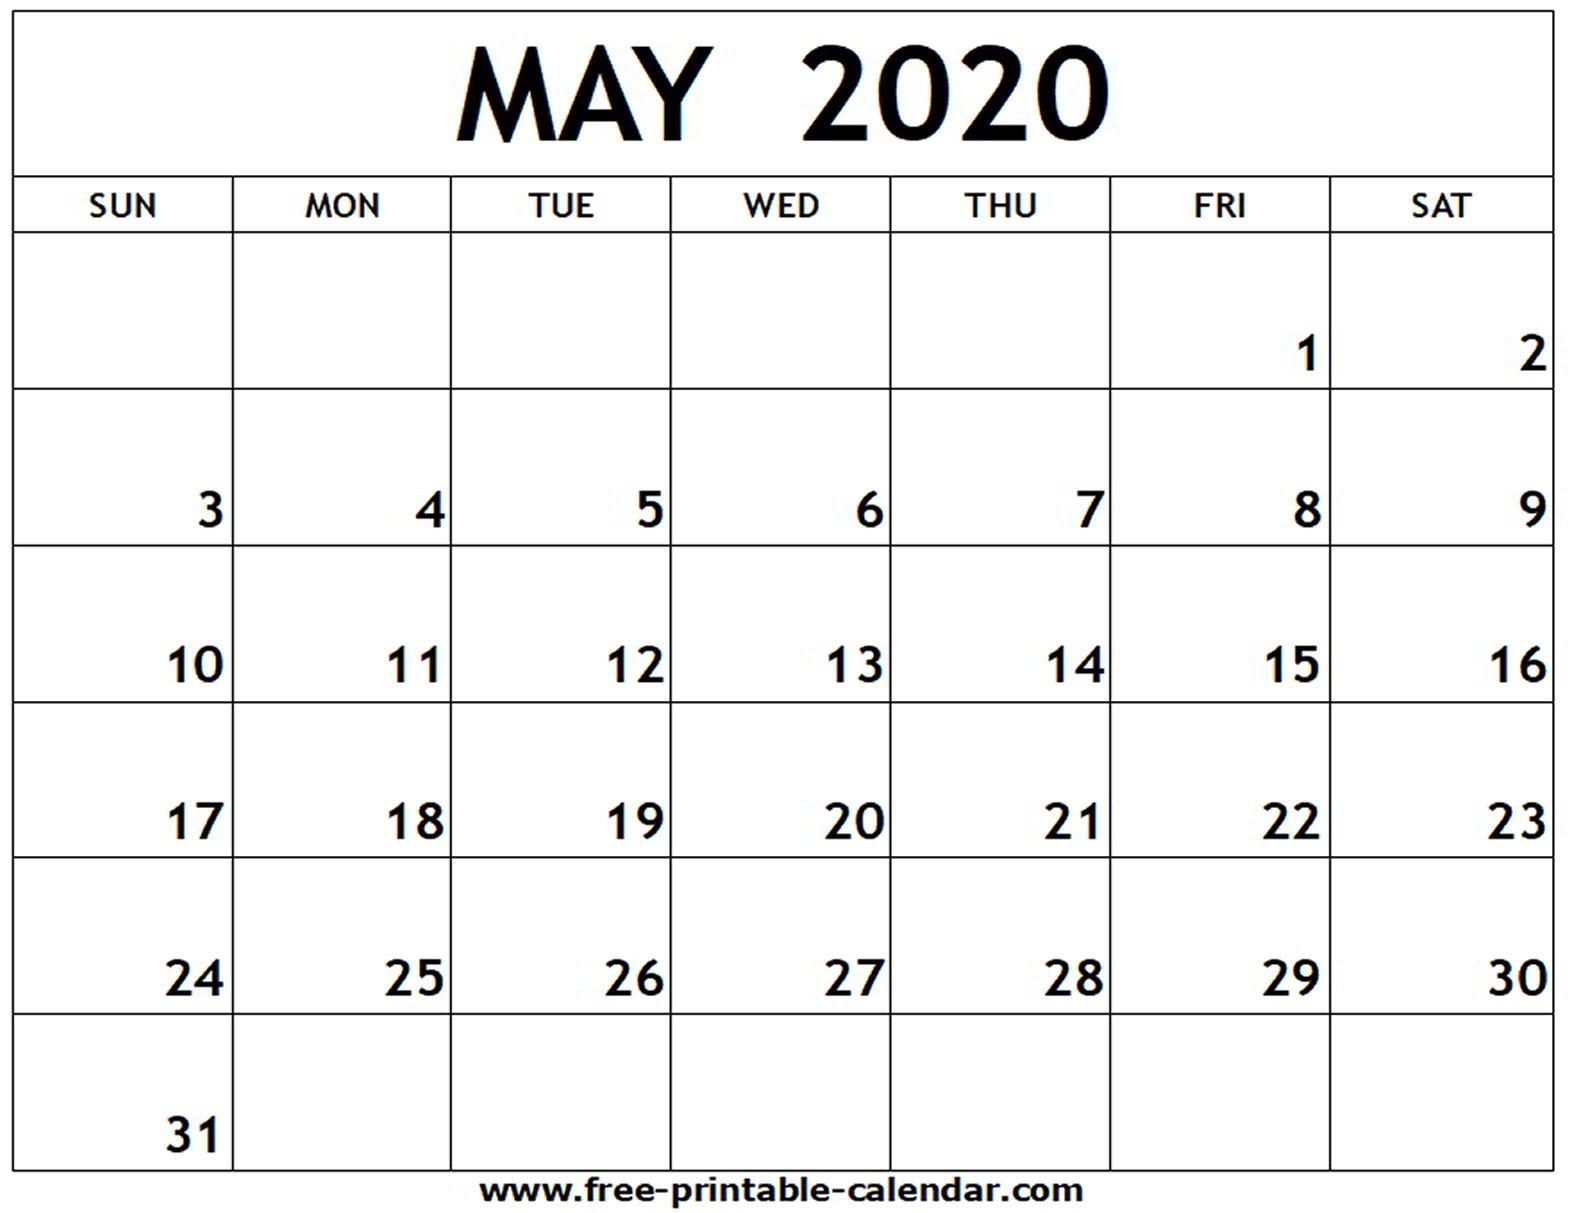 May 2020 Printable Calendar - Free-Printable-Calendar Calendar You Can Edit Free